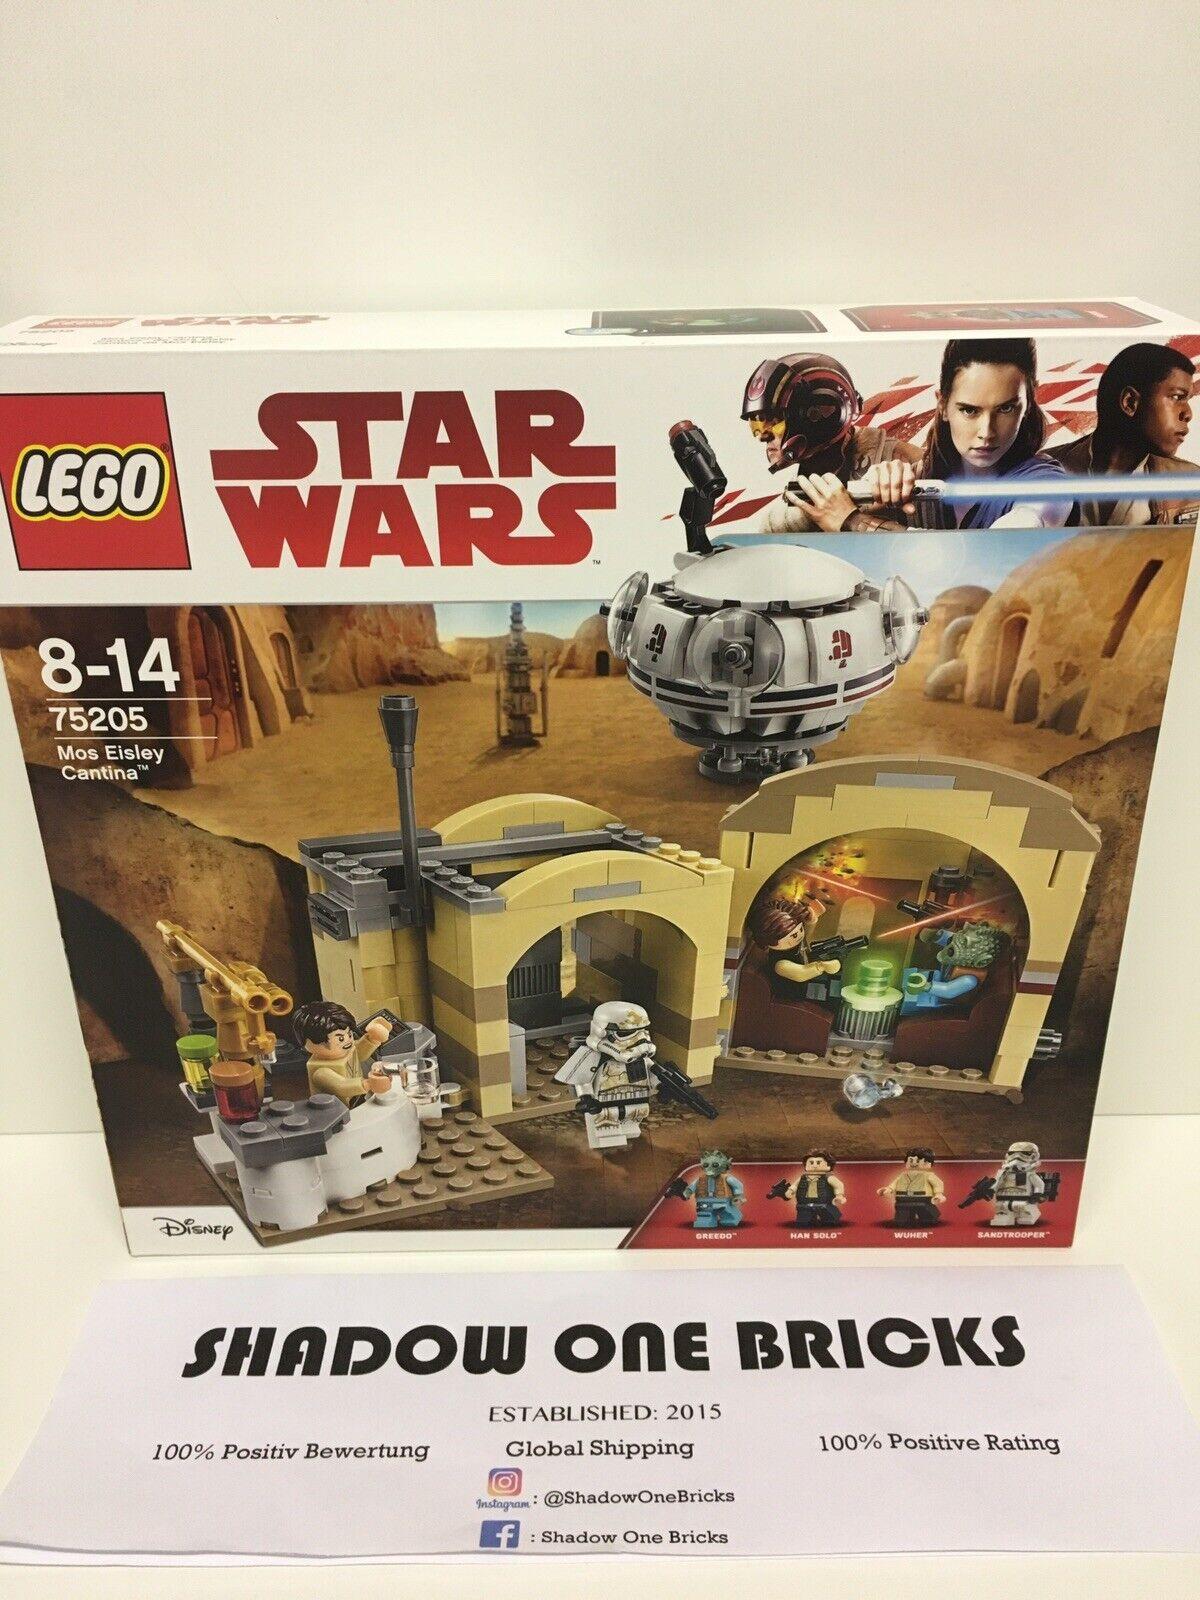 Lego Star Wars 75205 Mos Eisley Cantina NEU & OVP   NEW   SEALED